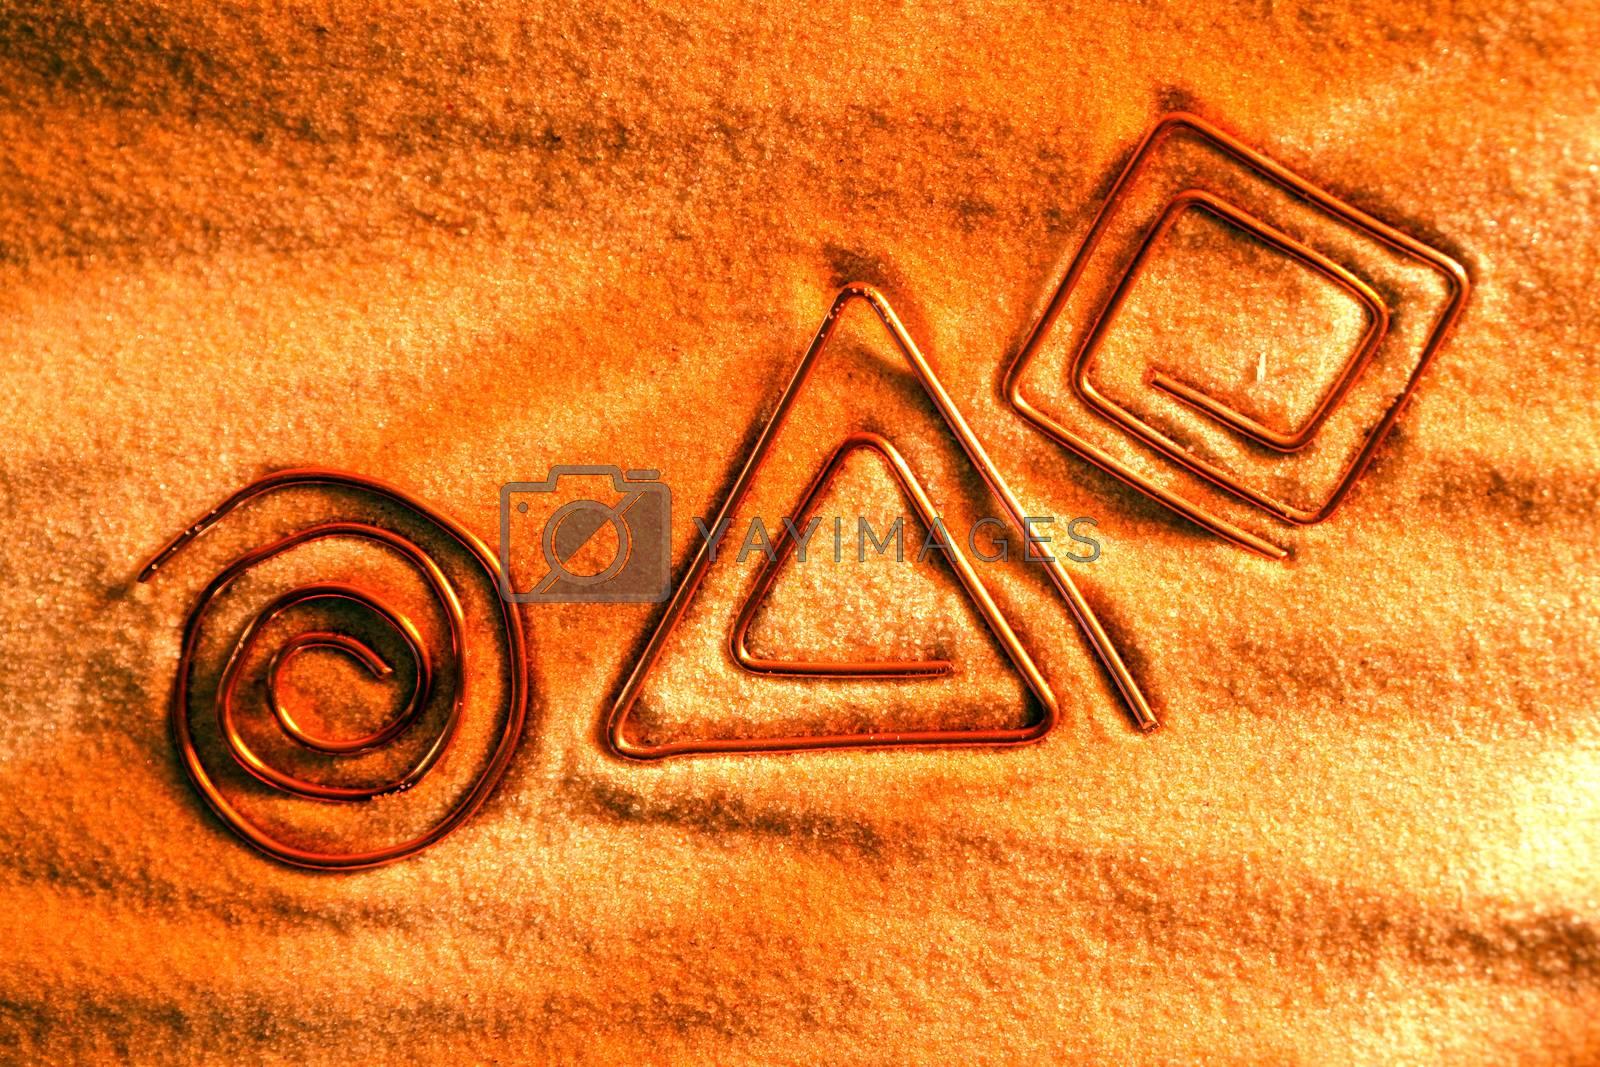 Royalty free image of Symbols On Sand by kvkirillov